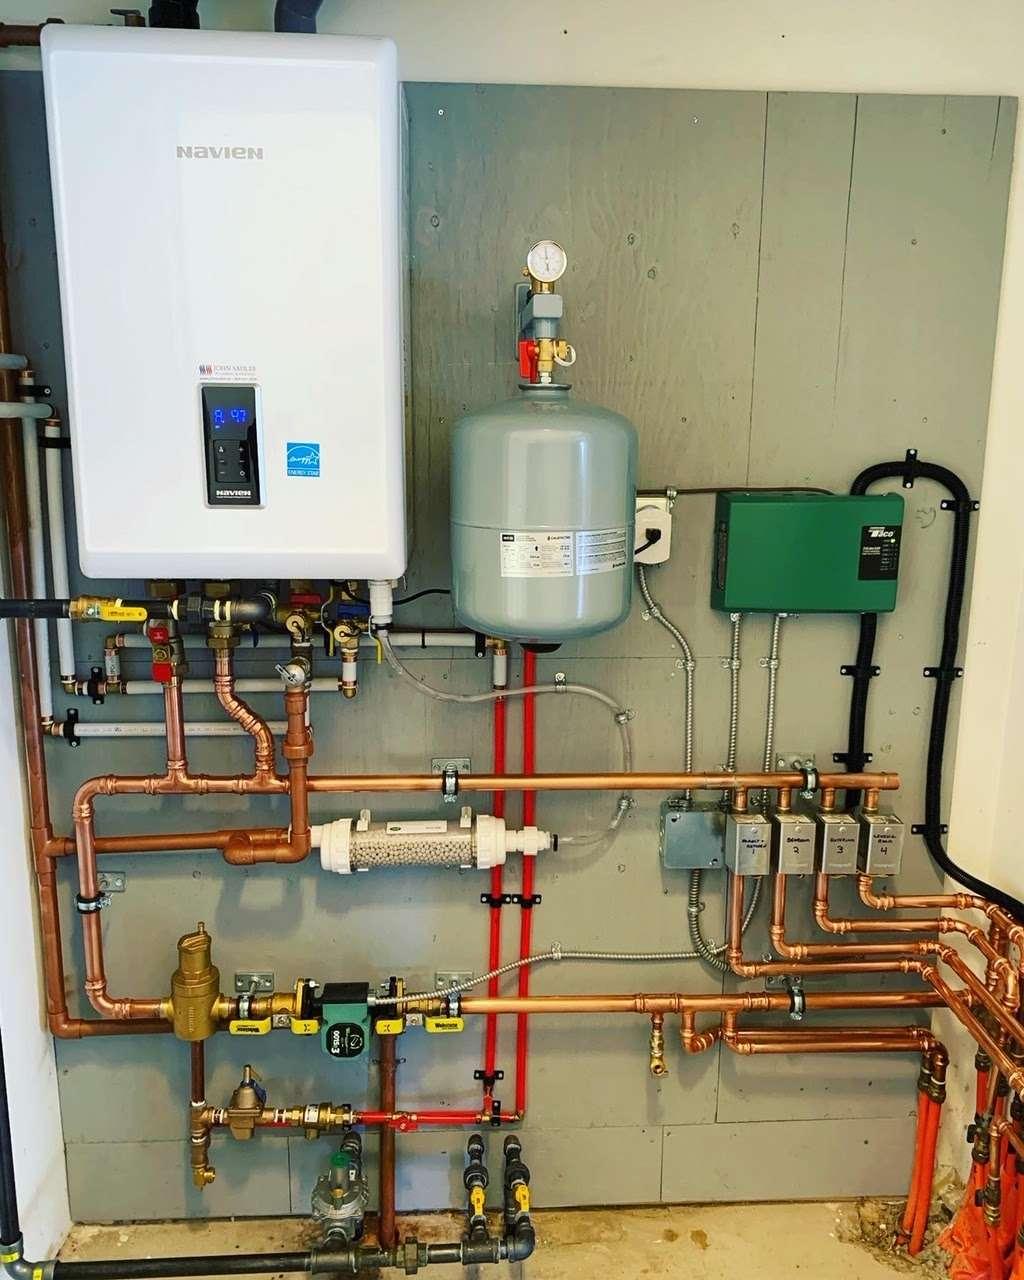 New Navien tankless water heater